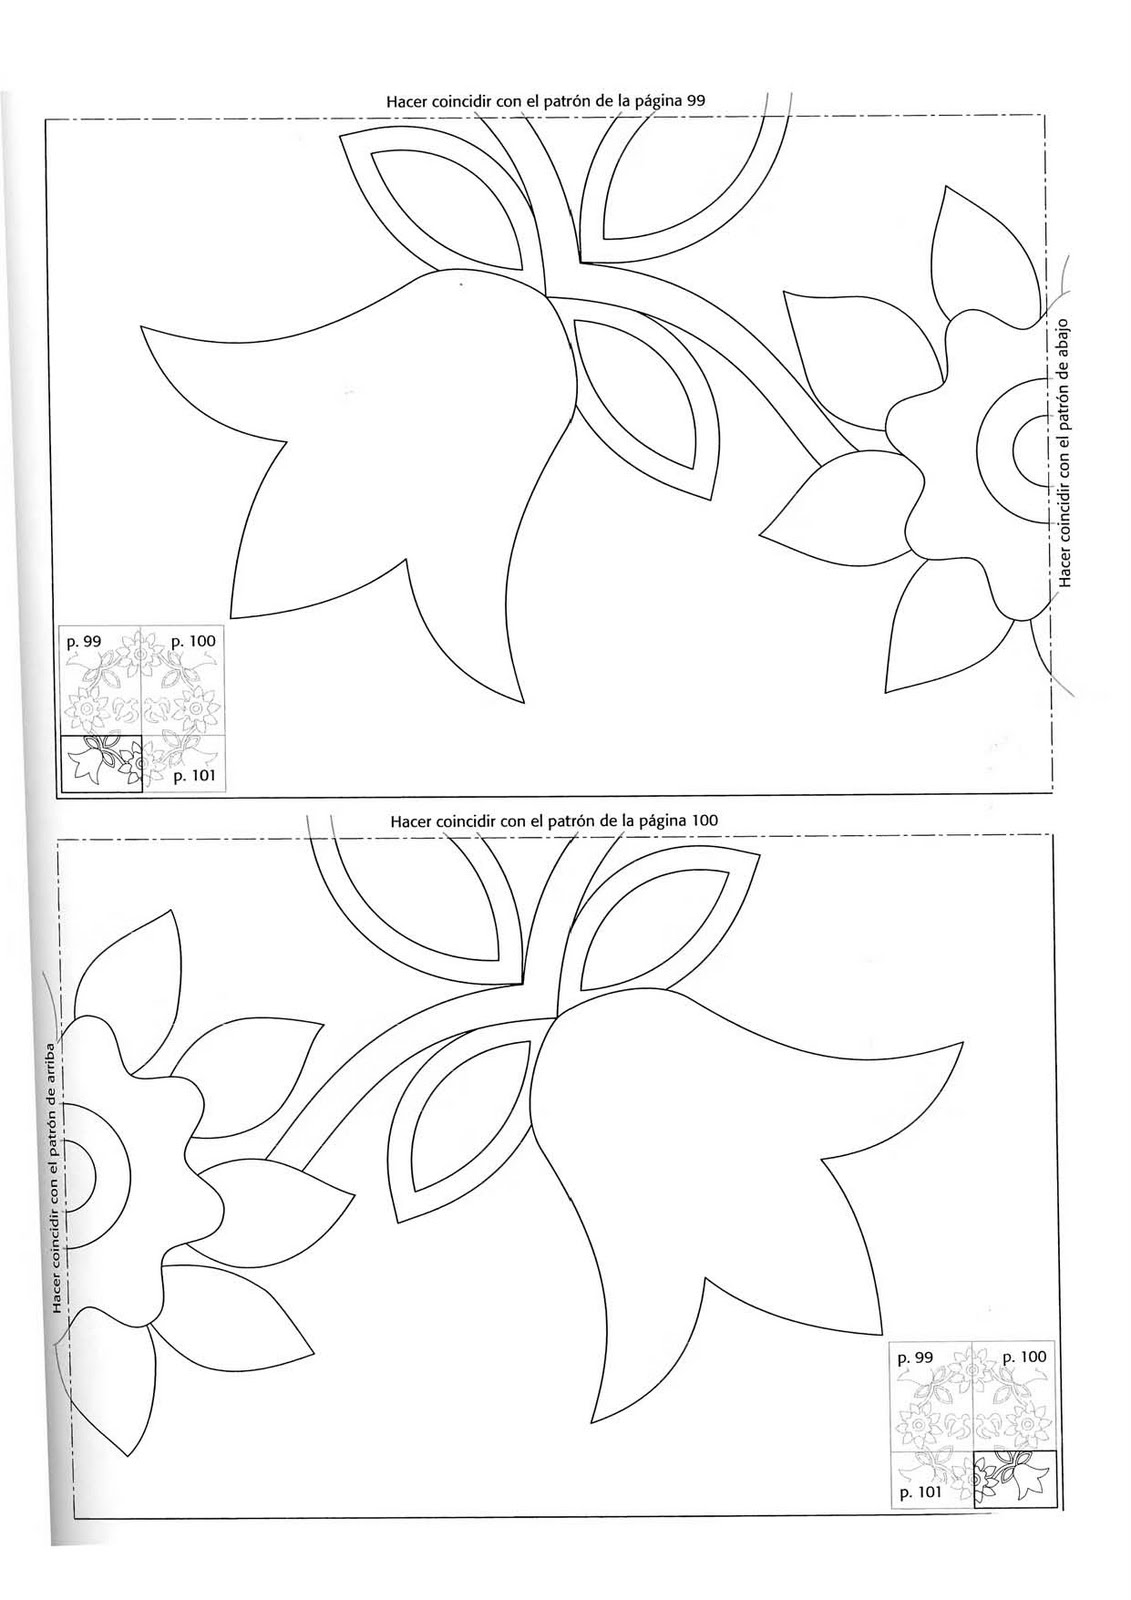 Dibujos artisticos para colorear - Dibujos para colorear - IMAGIXS